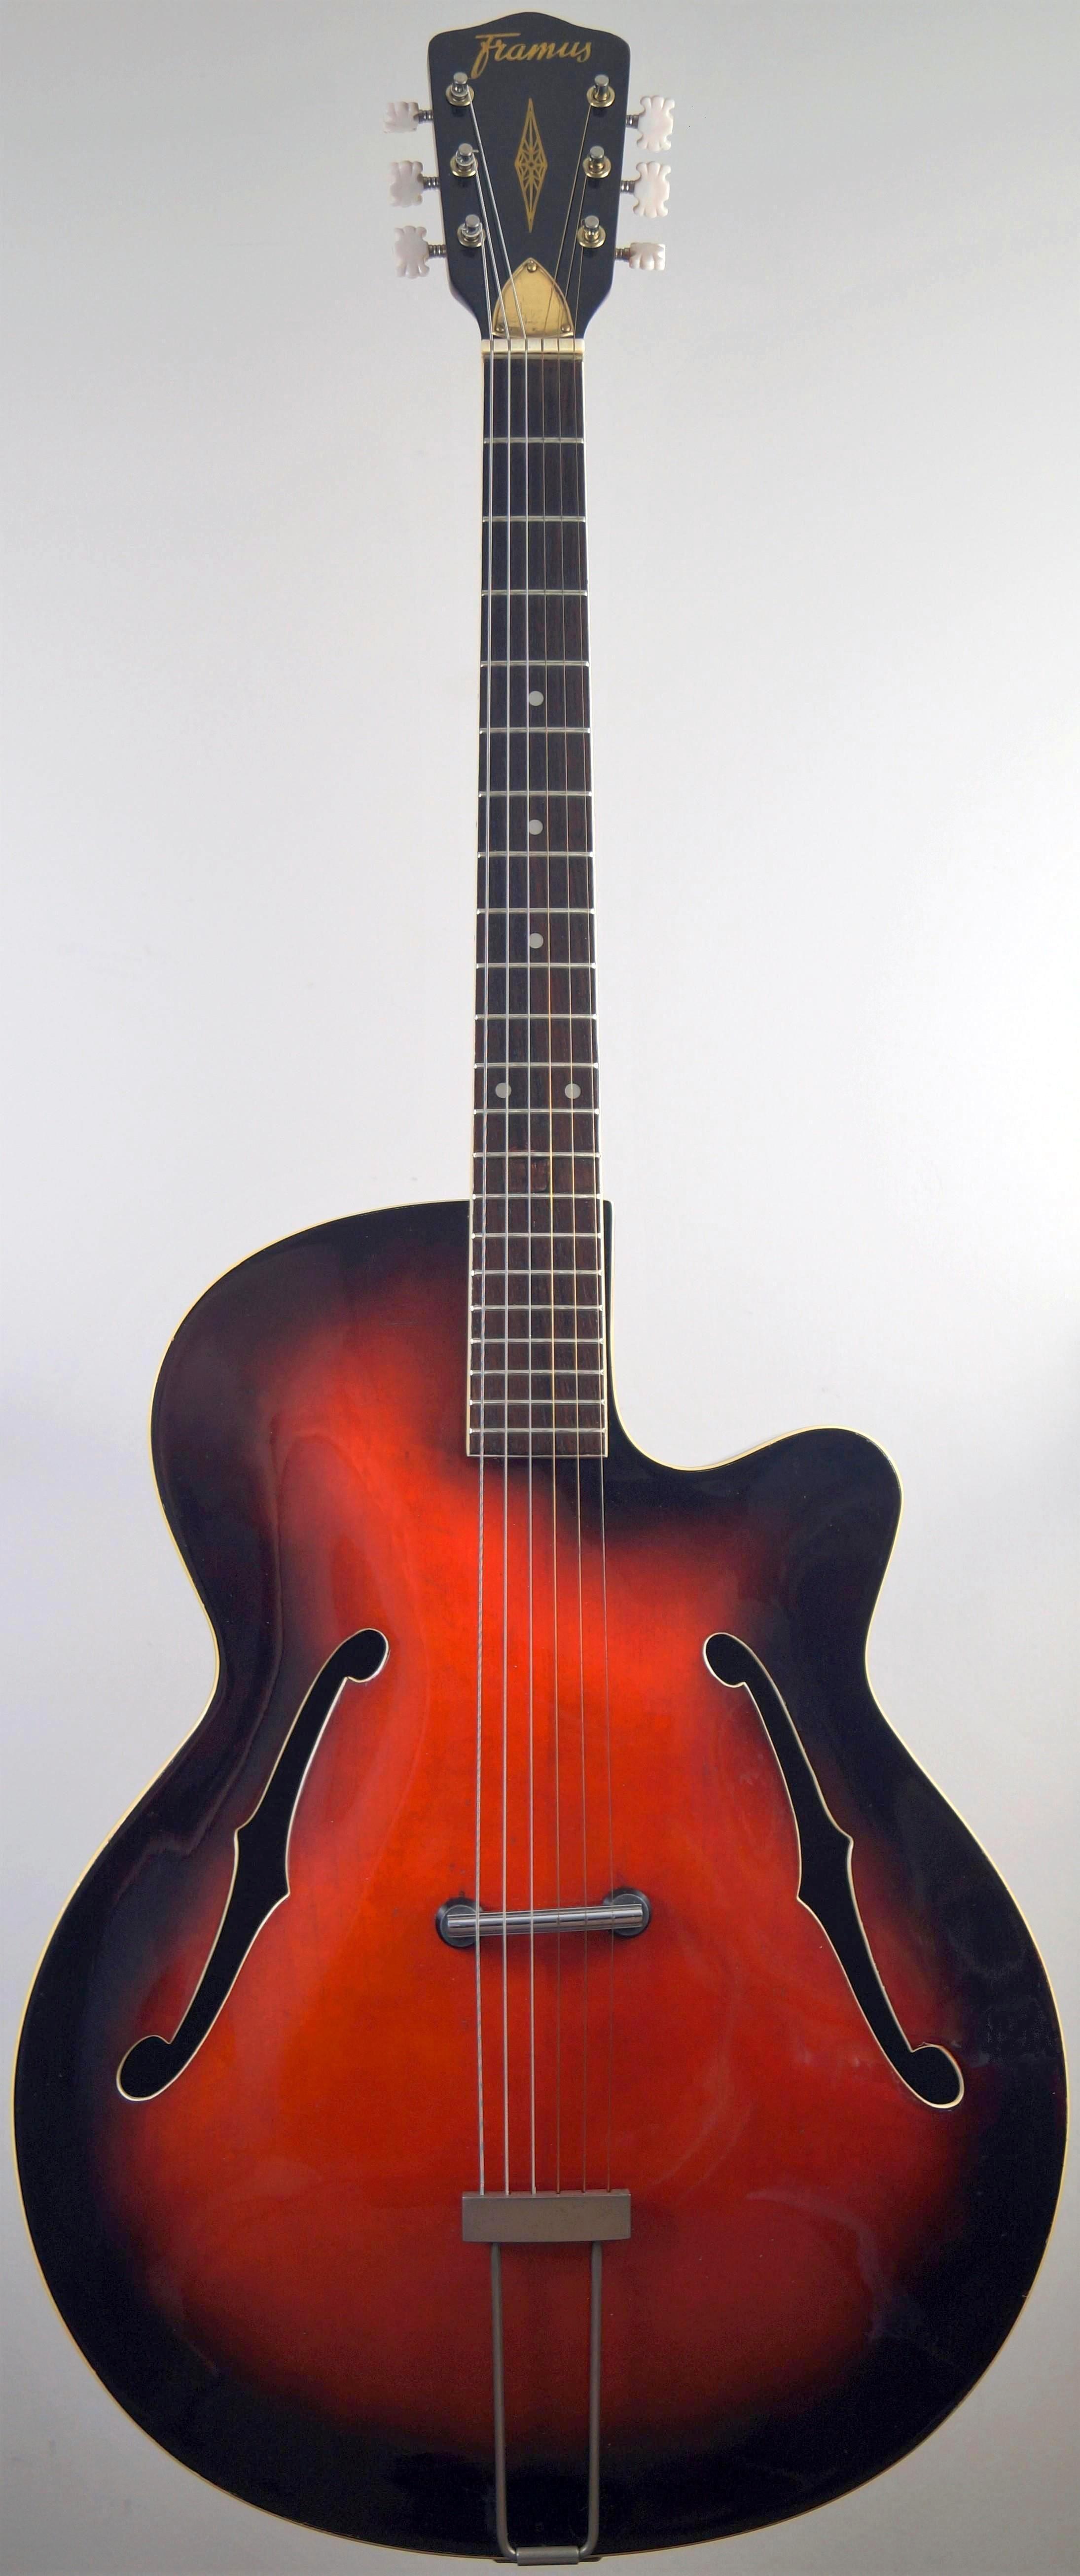 My Framus 5 54 Riviera Acoustic Archtop Guitar at Ukulele Corner inc